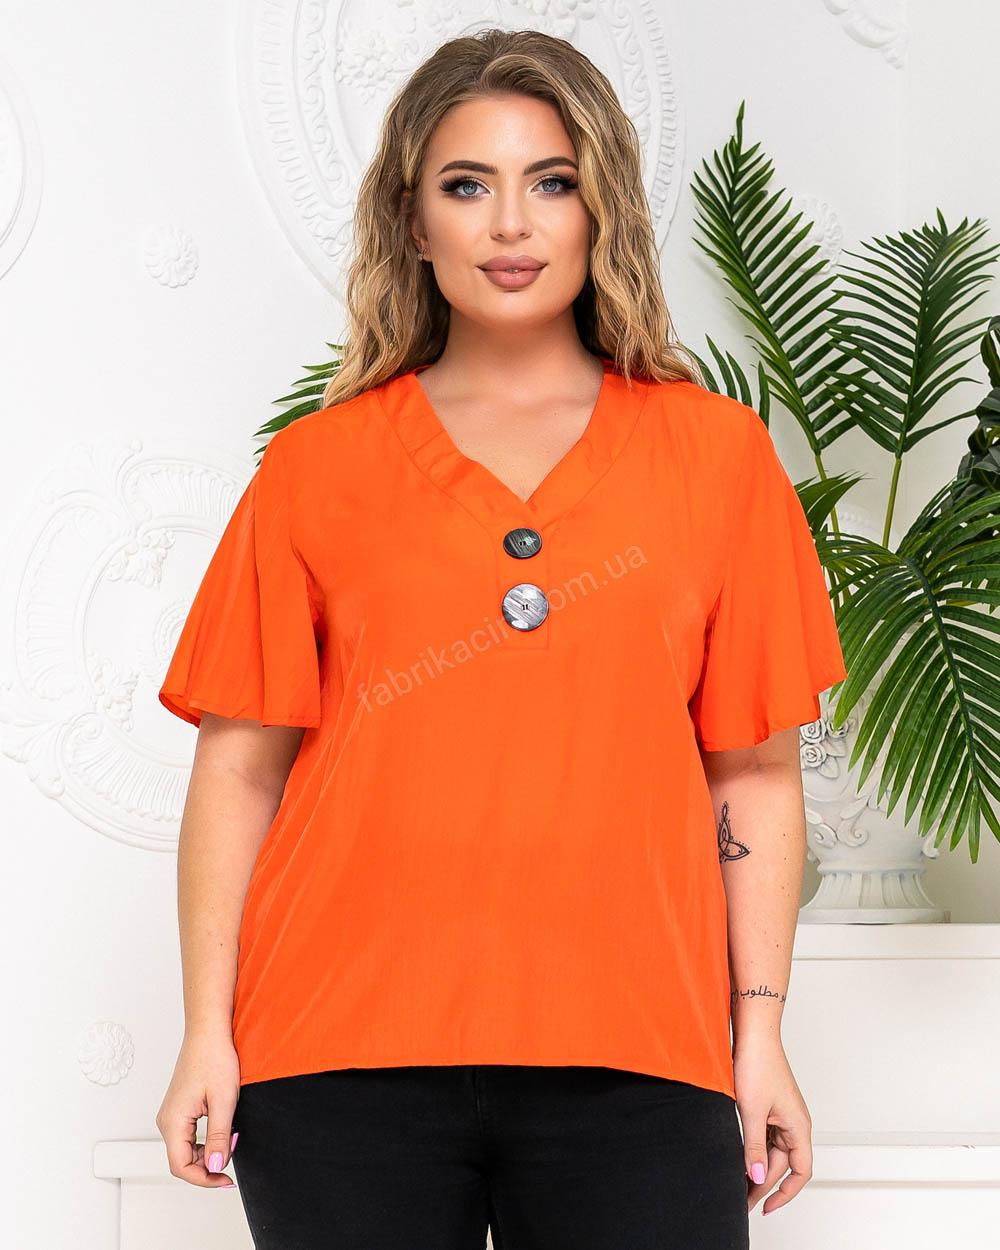 Блузка на двух пуговицах р-р: 50 - 56 цвет: кирпичный - 1